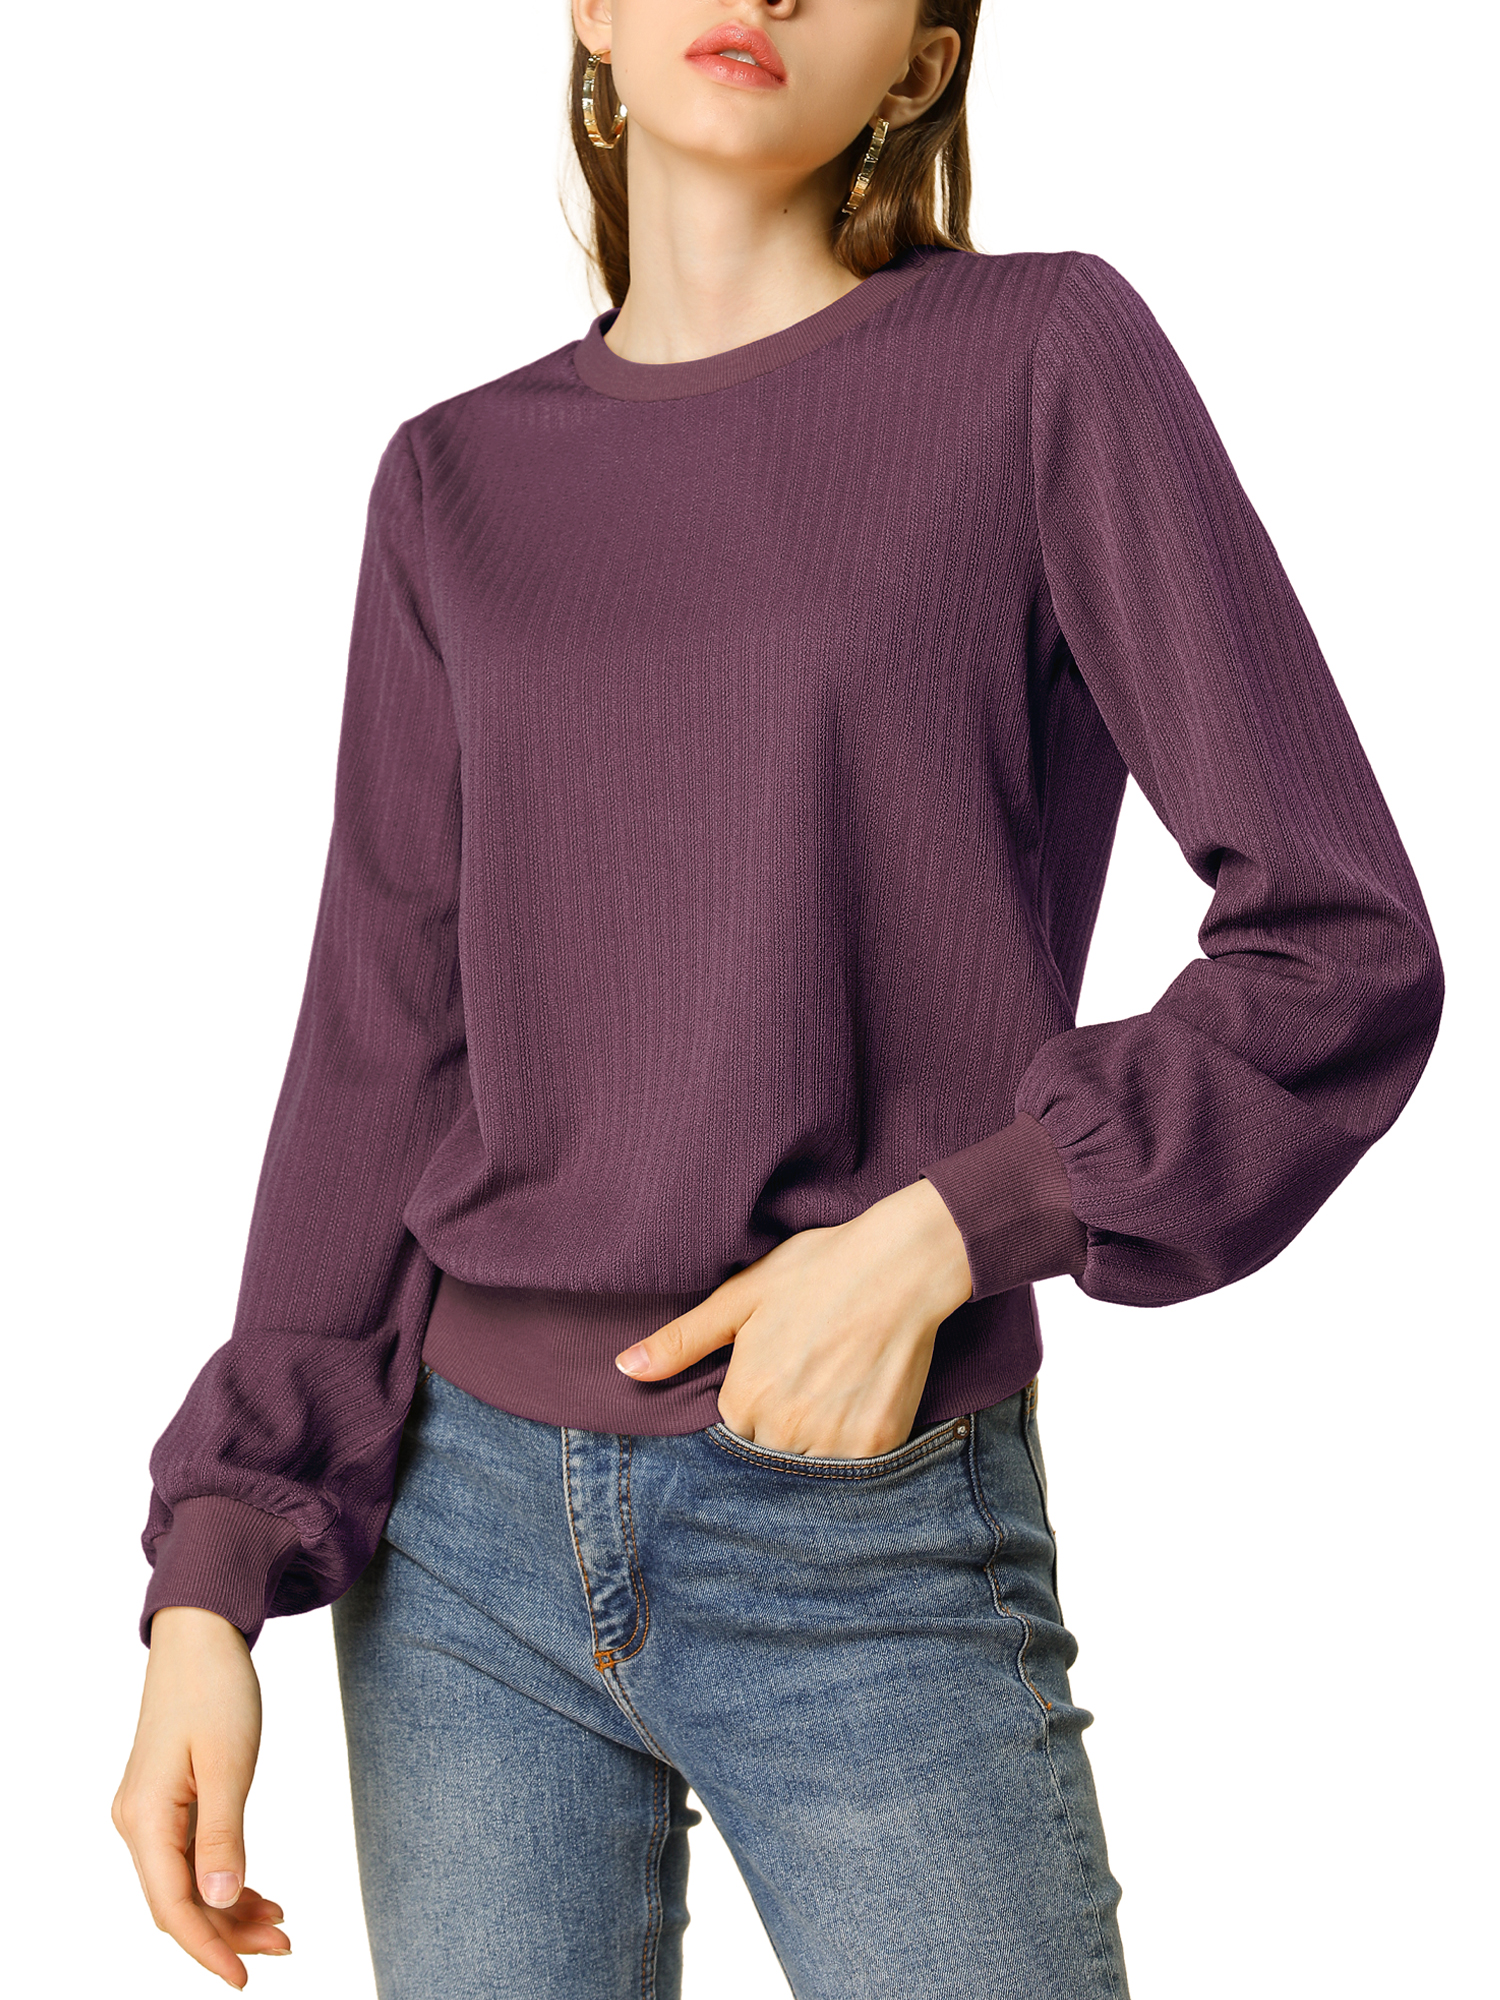 Allegra K Women's Lantern Sleeves Blouson Ribbed Top Sweater Gray Purple XL